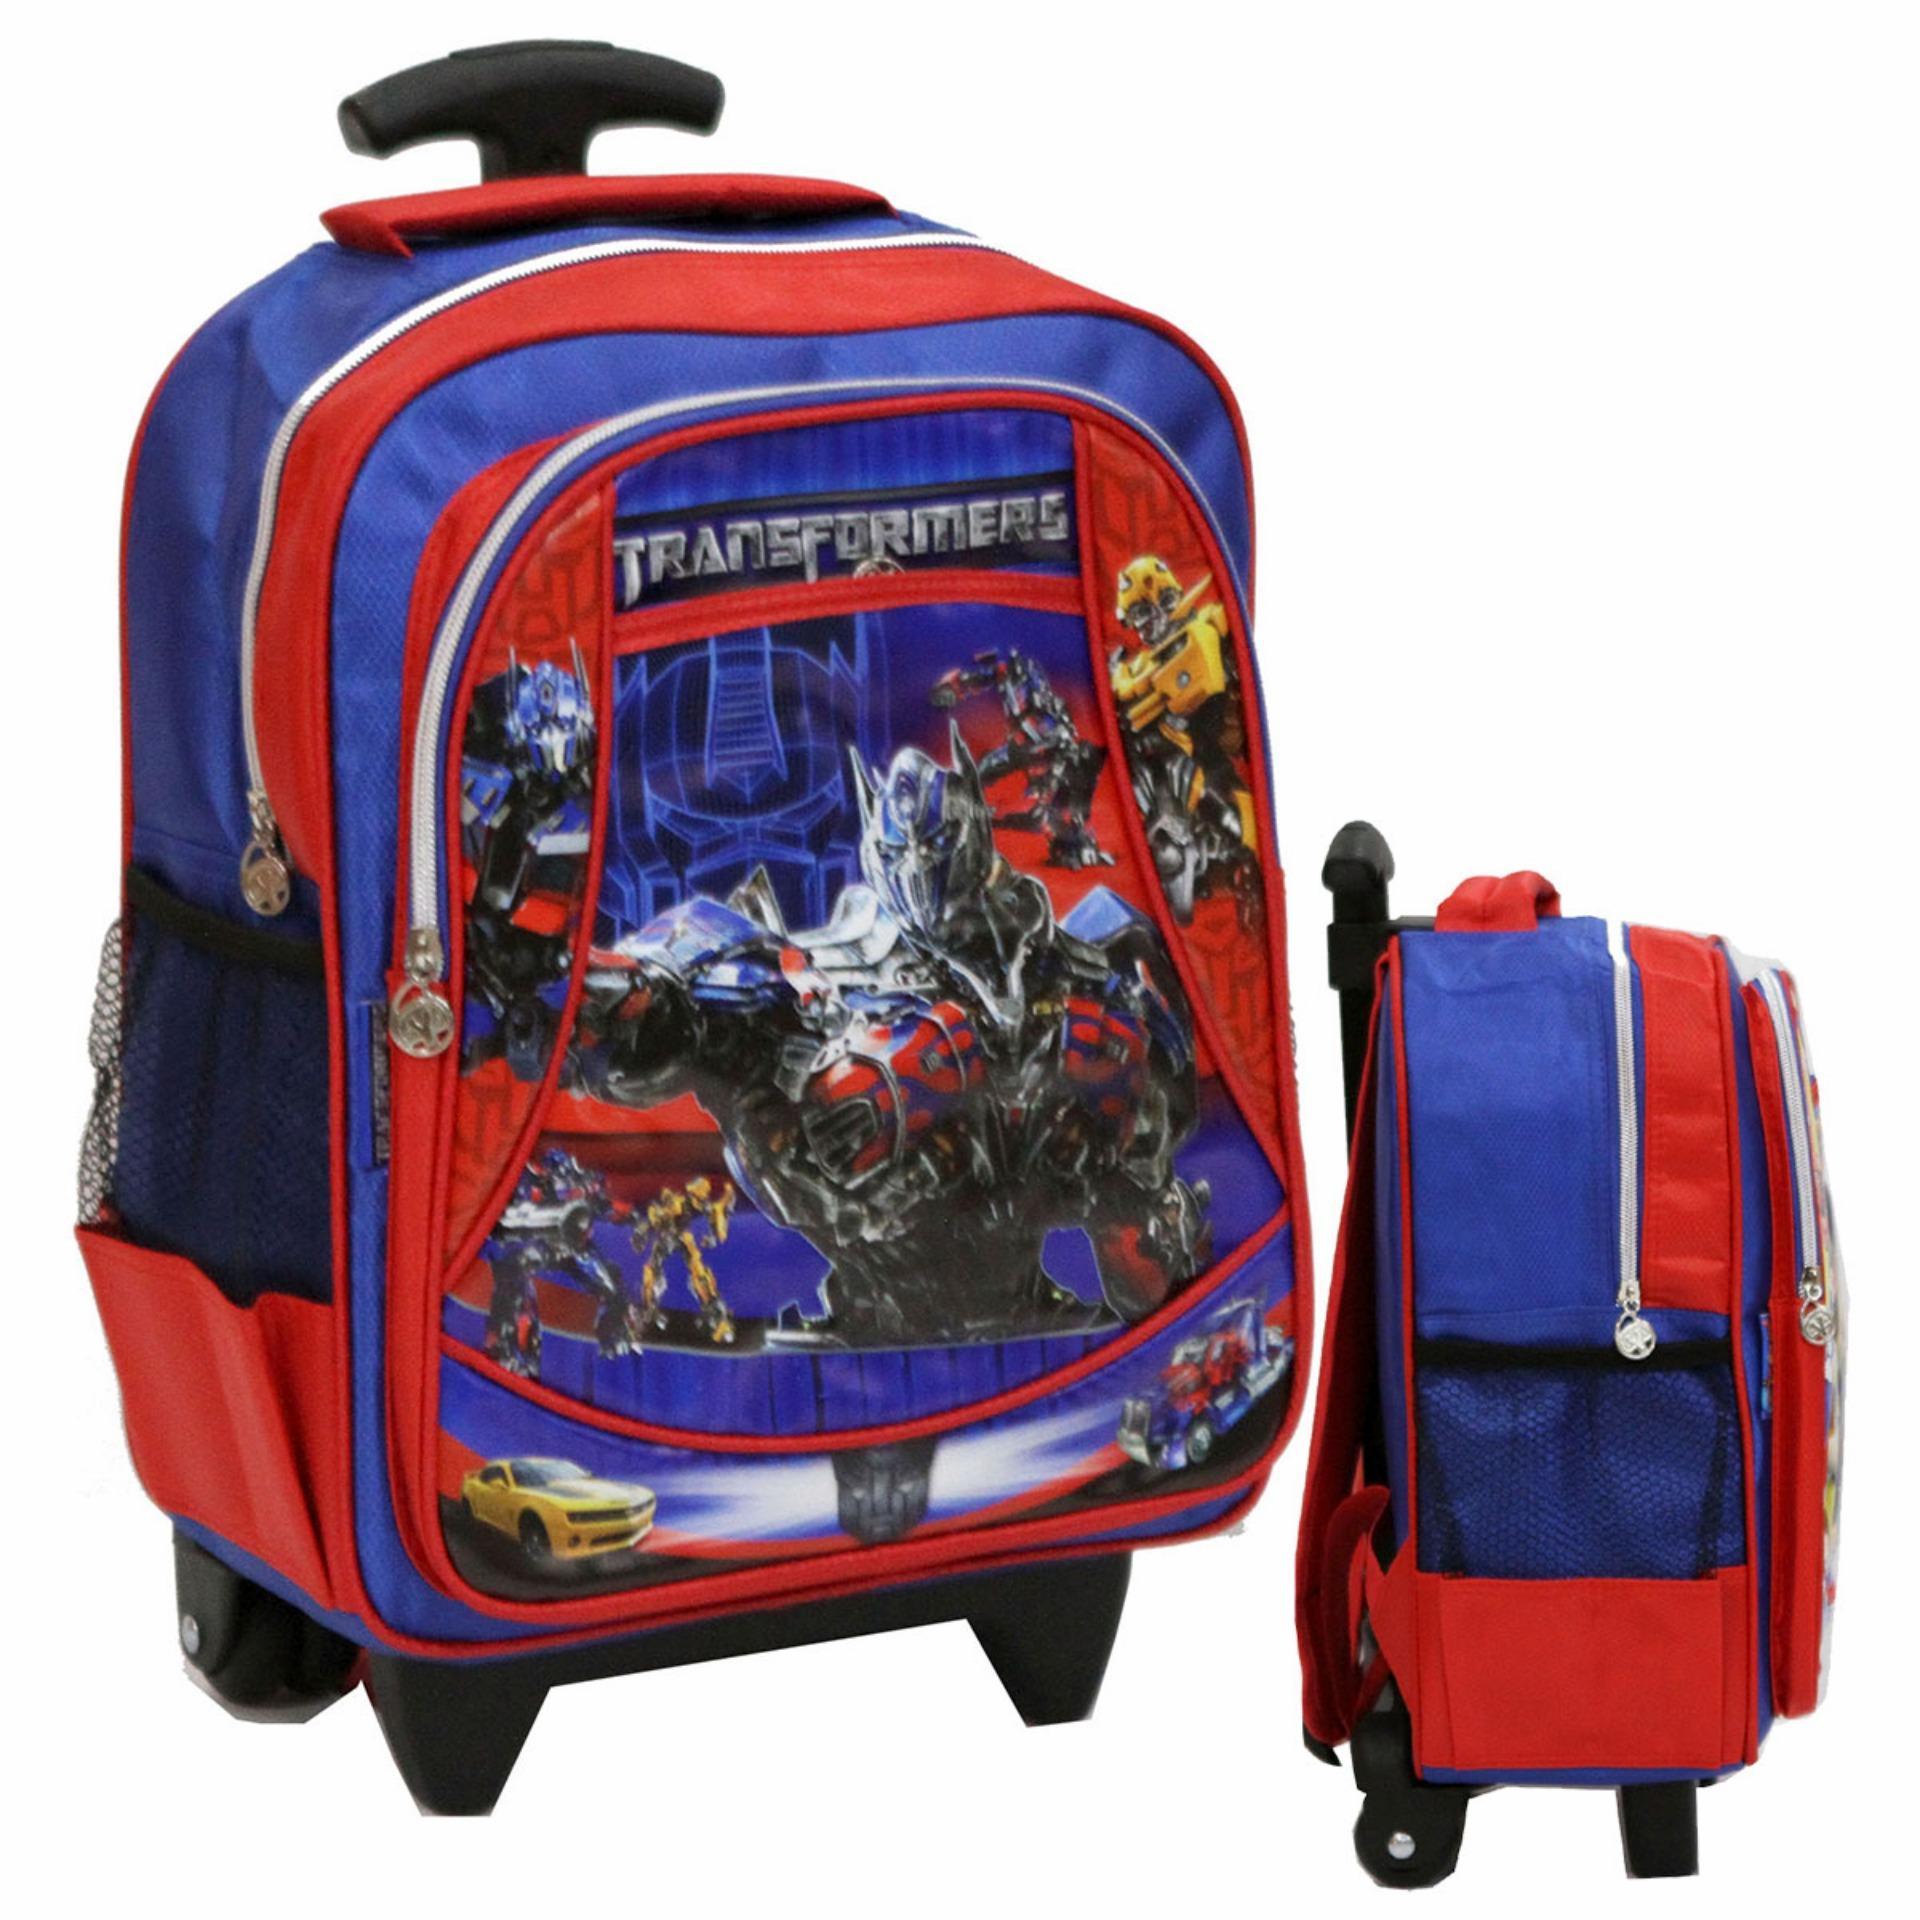 Onlan Tas Trolley Anak Sekolah Play Group Atau TK Model Kantung Unik